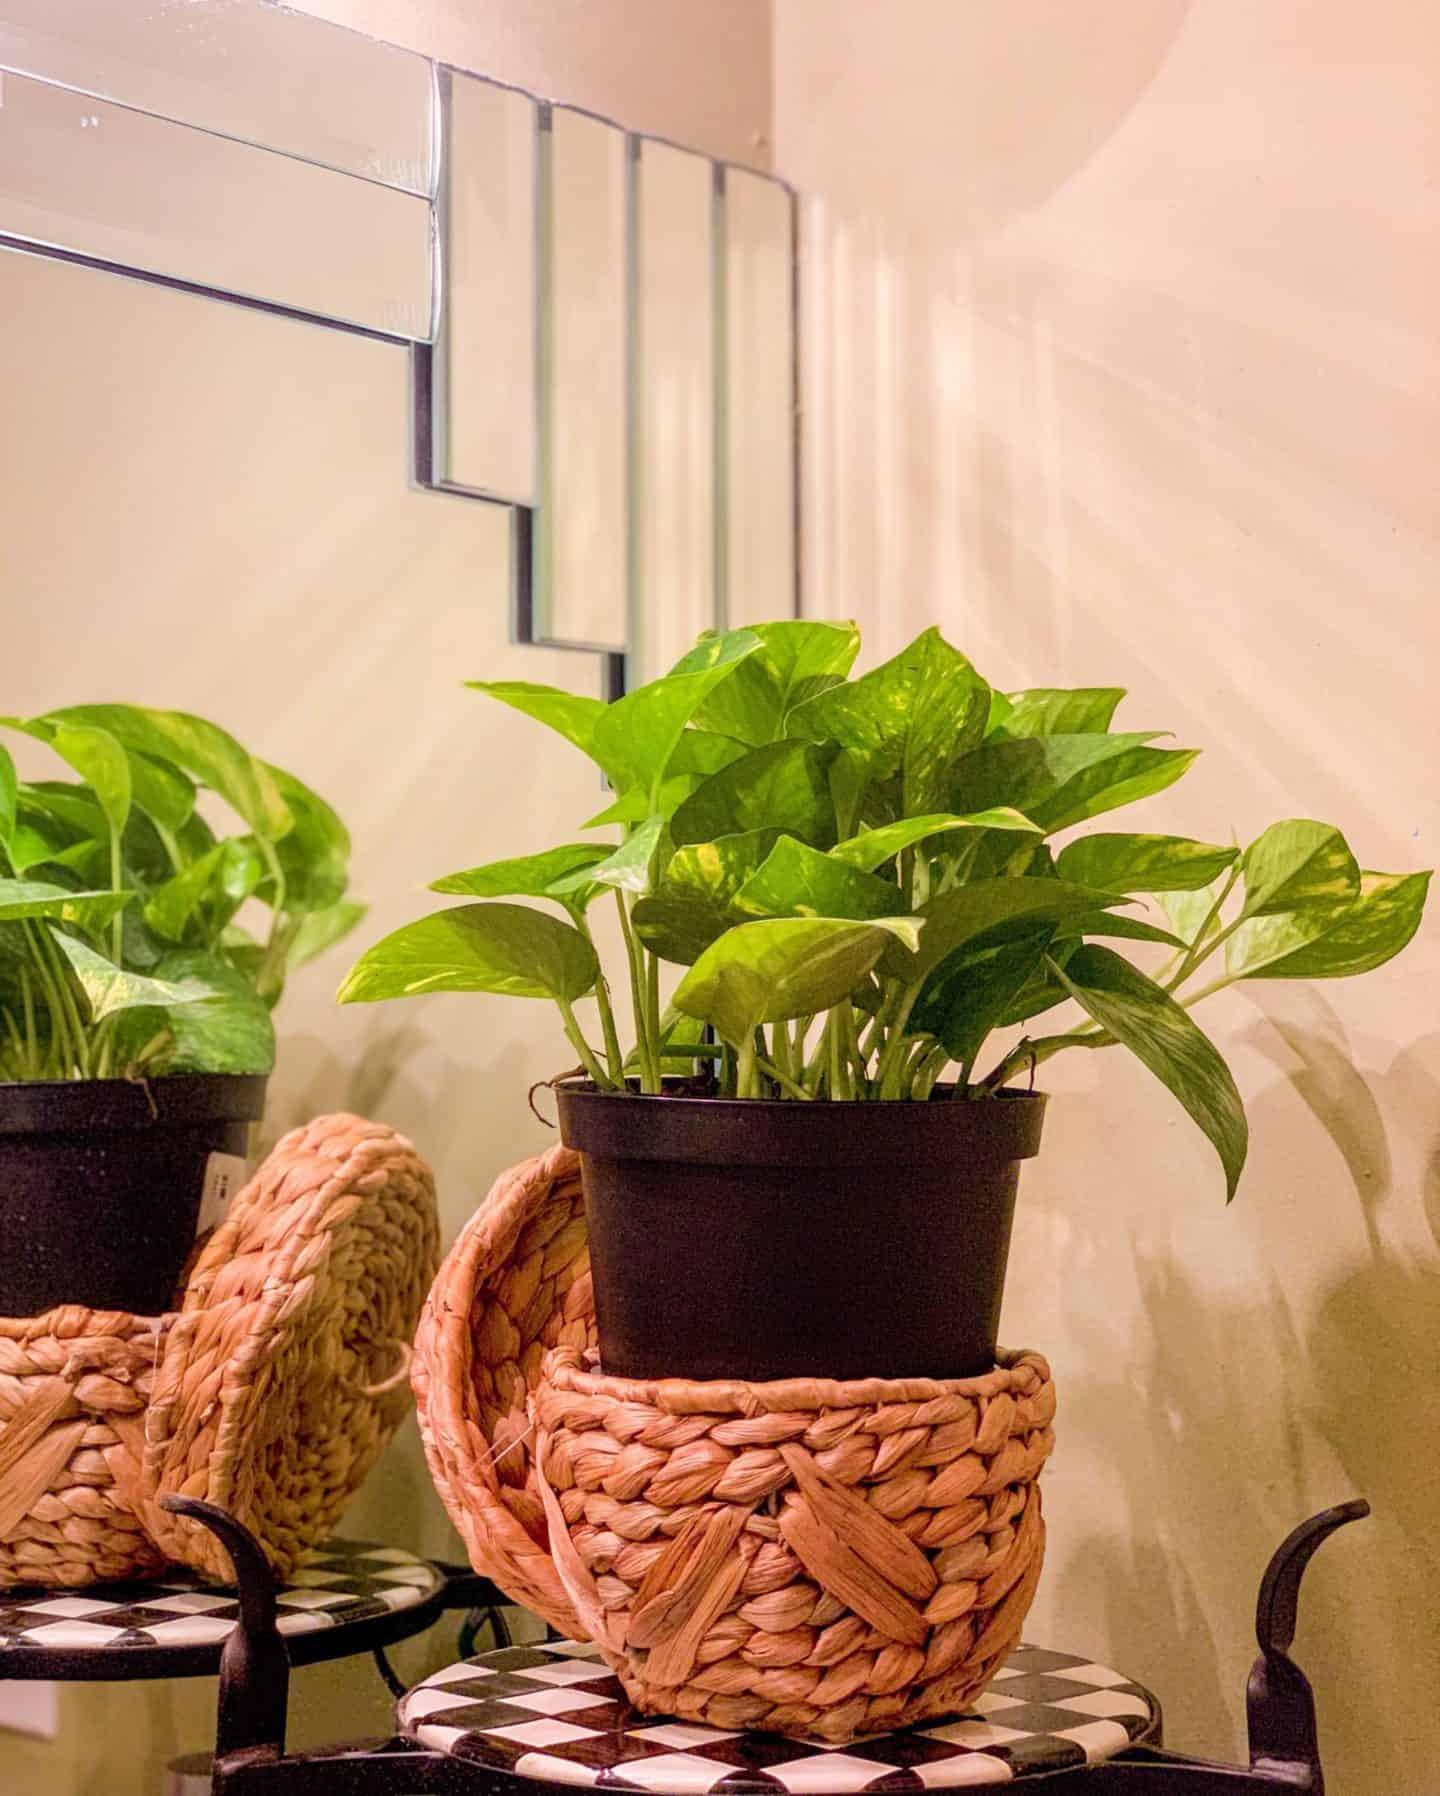 Shaunda Necole- Bohemian plants in the bathroom